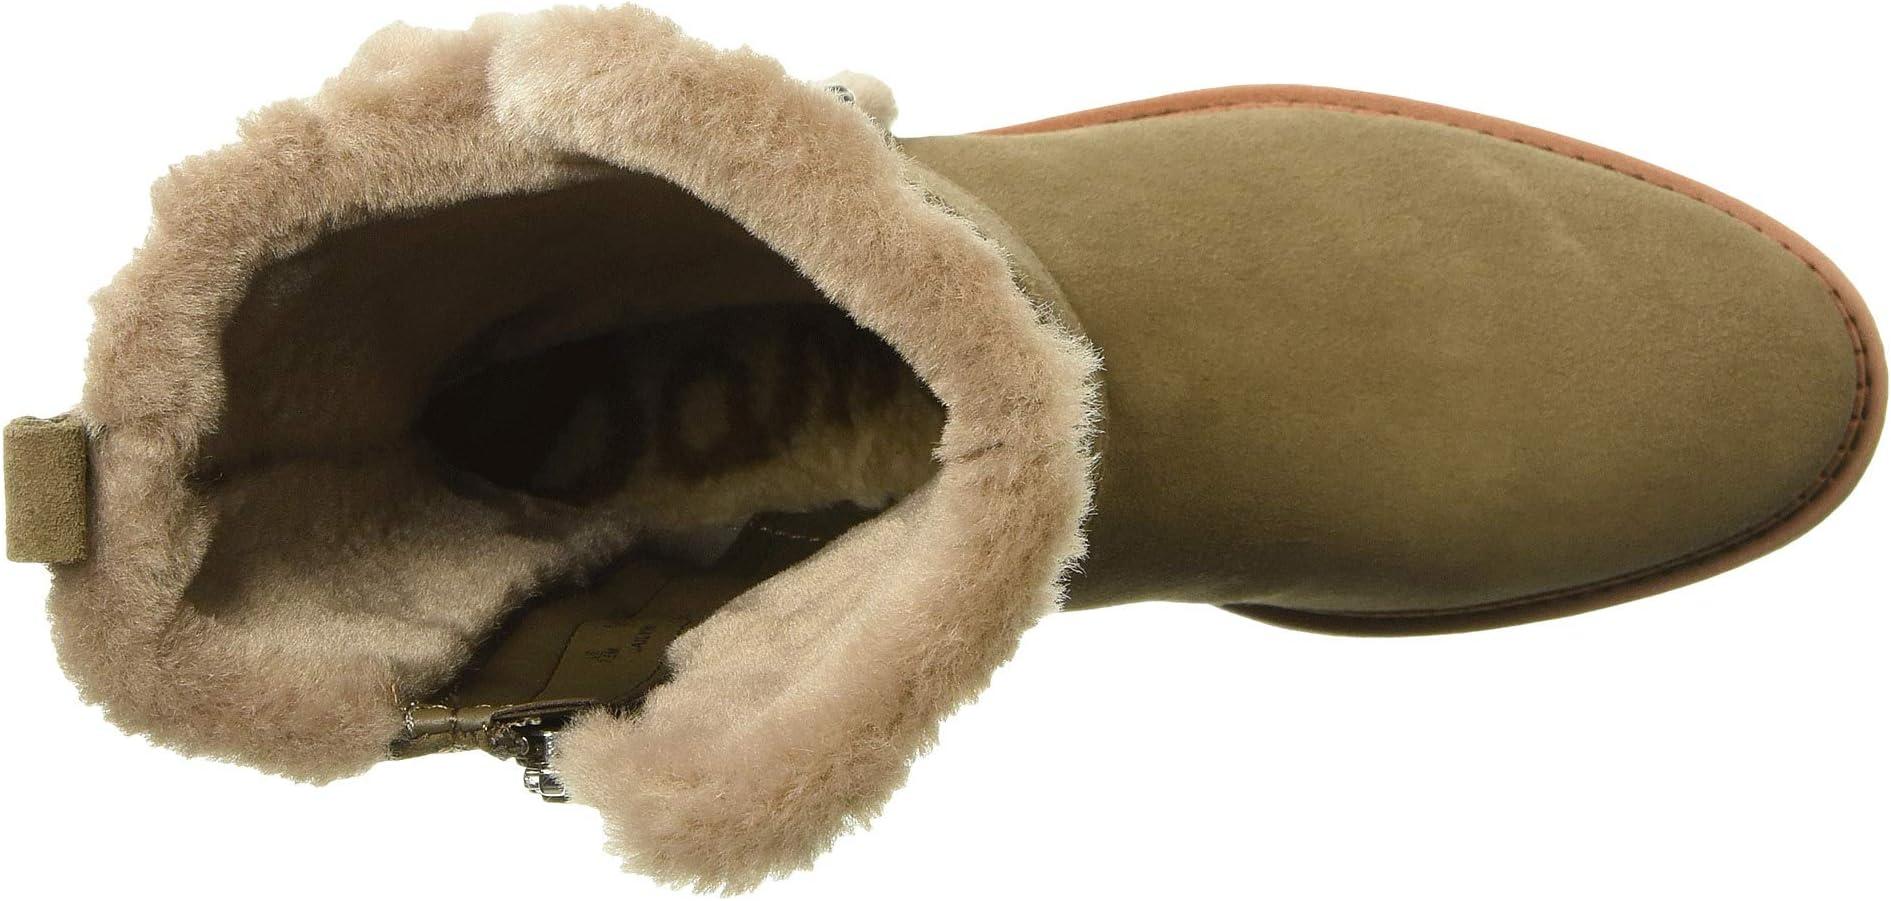 Sam Edelman Jailyn   Women's shoes   2020 Newest